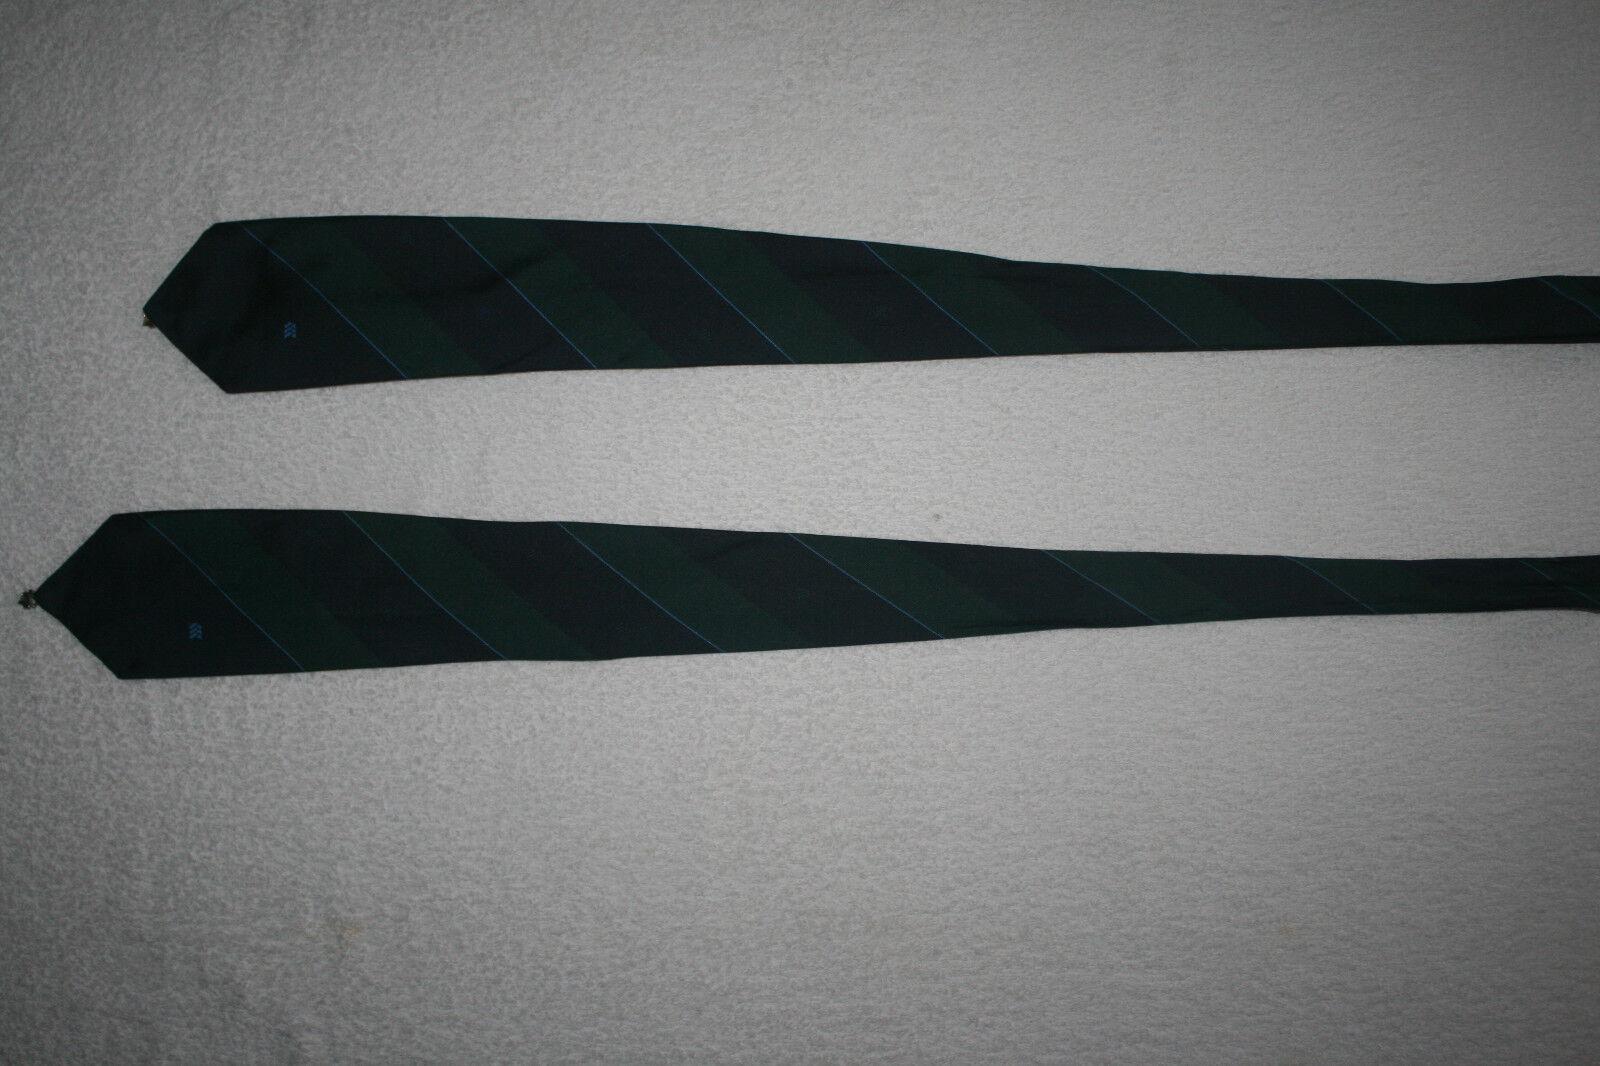 2 Stück Krawatten Herrenkrawatten Fliegen Mehrfarbig a reiner Seide Standardform